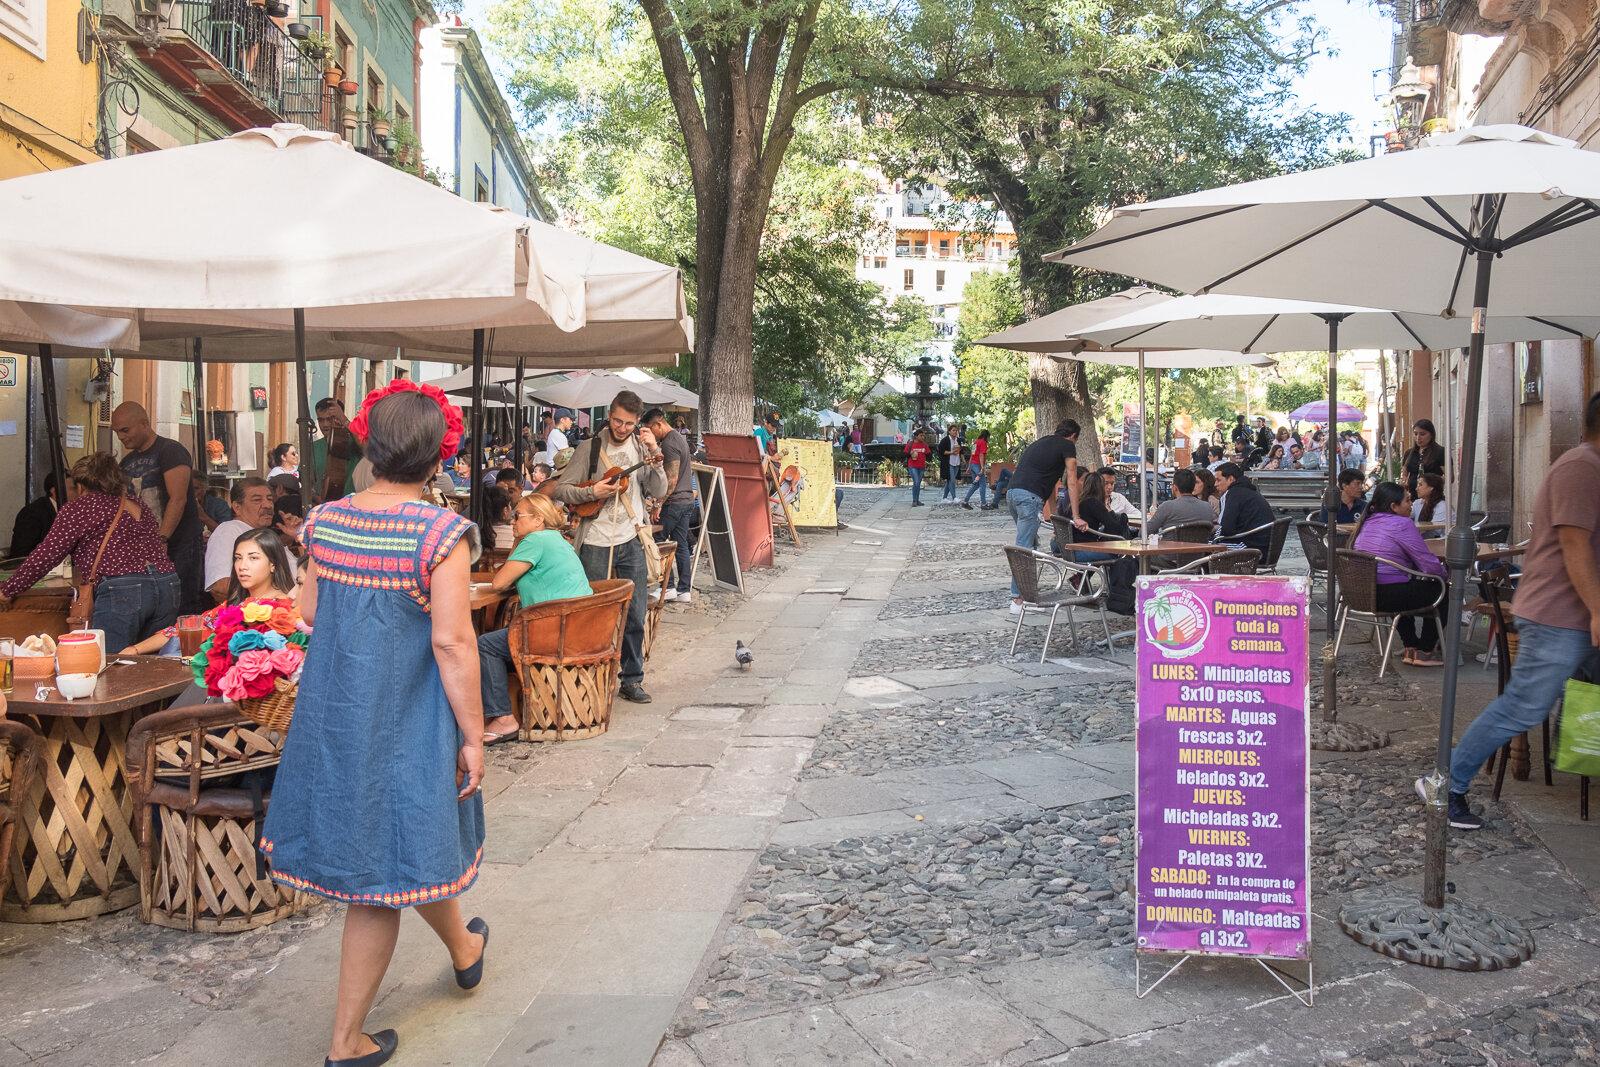 2019.10.8_Mexico_Guanajuato13_Britt first year.jpg